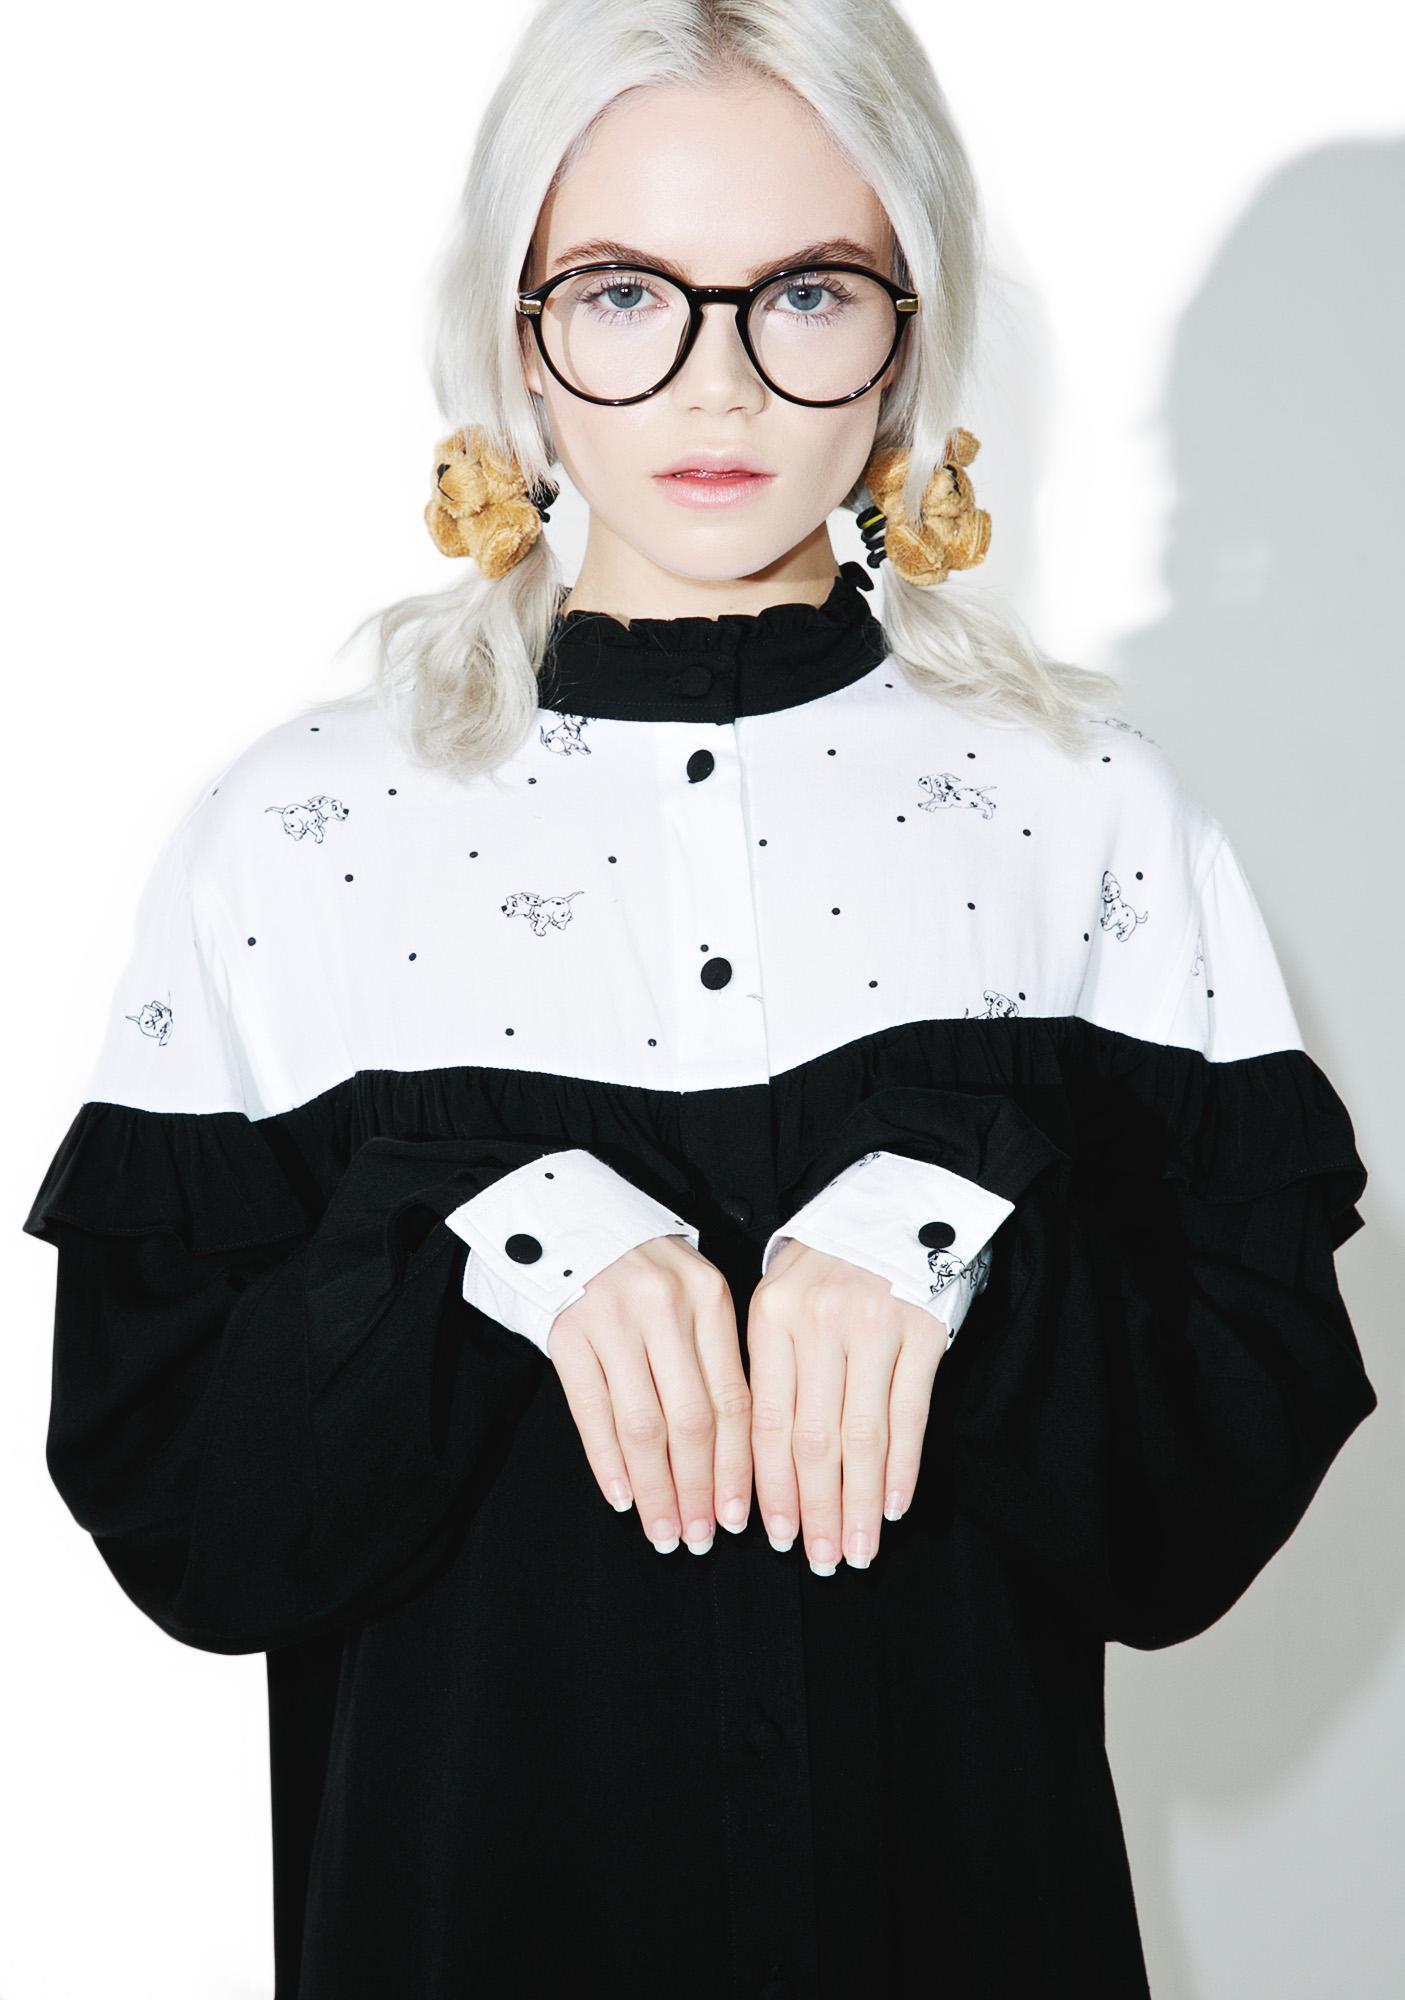 Lazy Oaf X Disney 101 Dalmatians Shirt